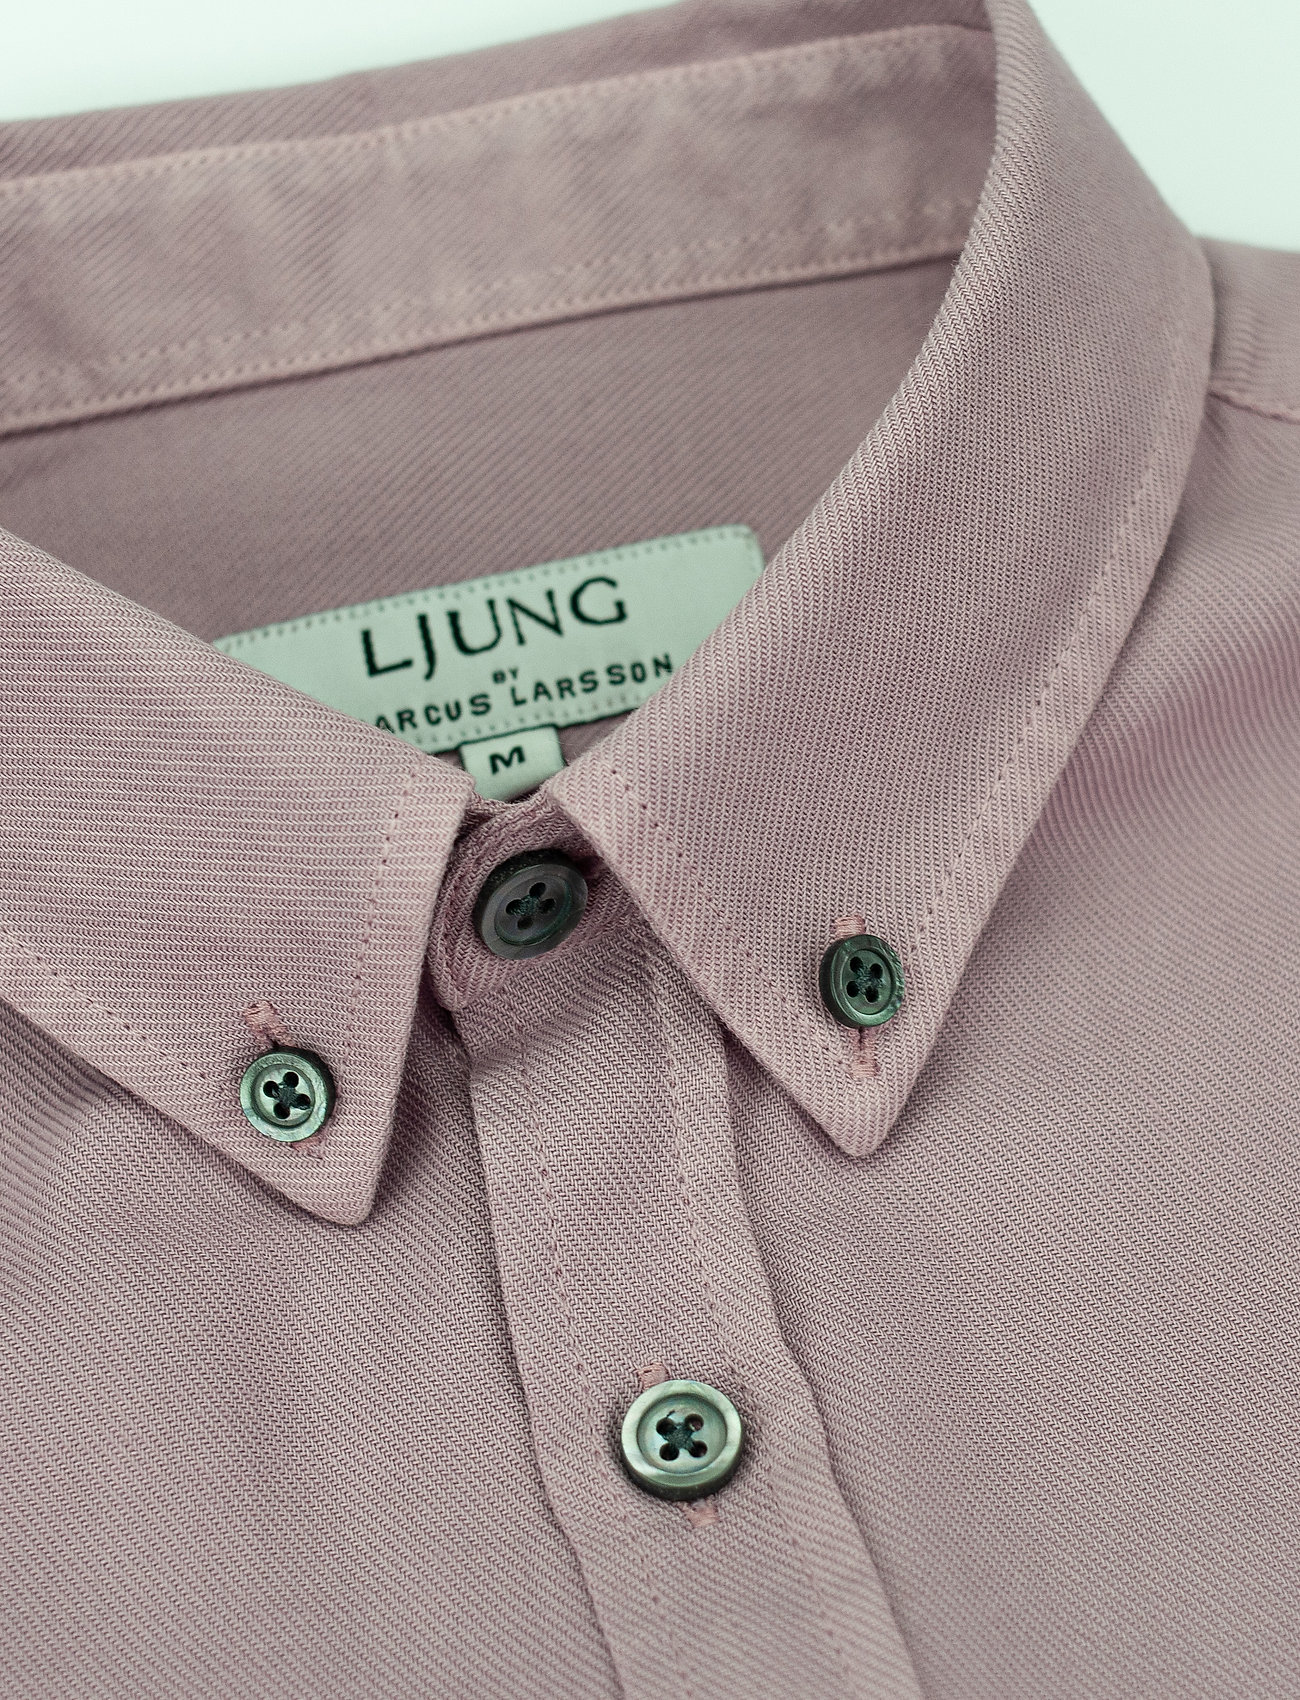 LJUNG by Marcus Larsson - Washed Twill Shirt - chemises de lin - mauve purple - 4